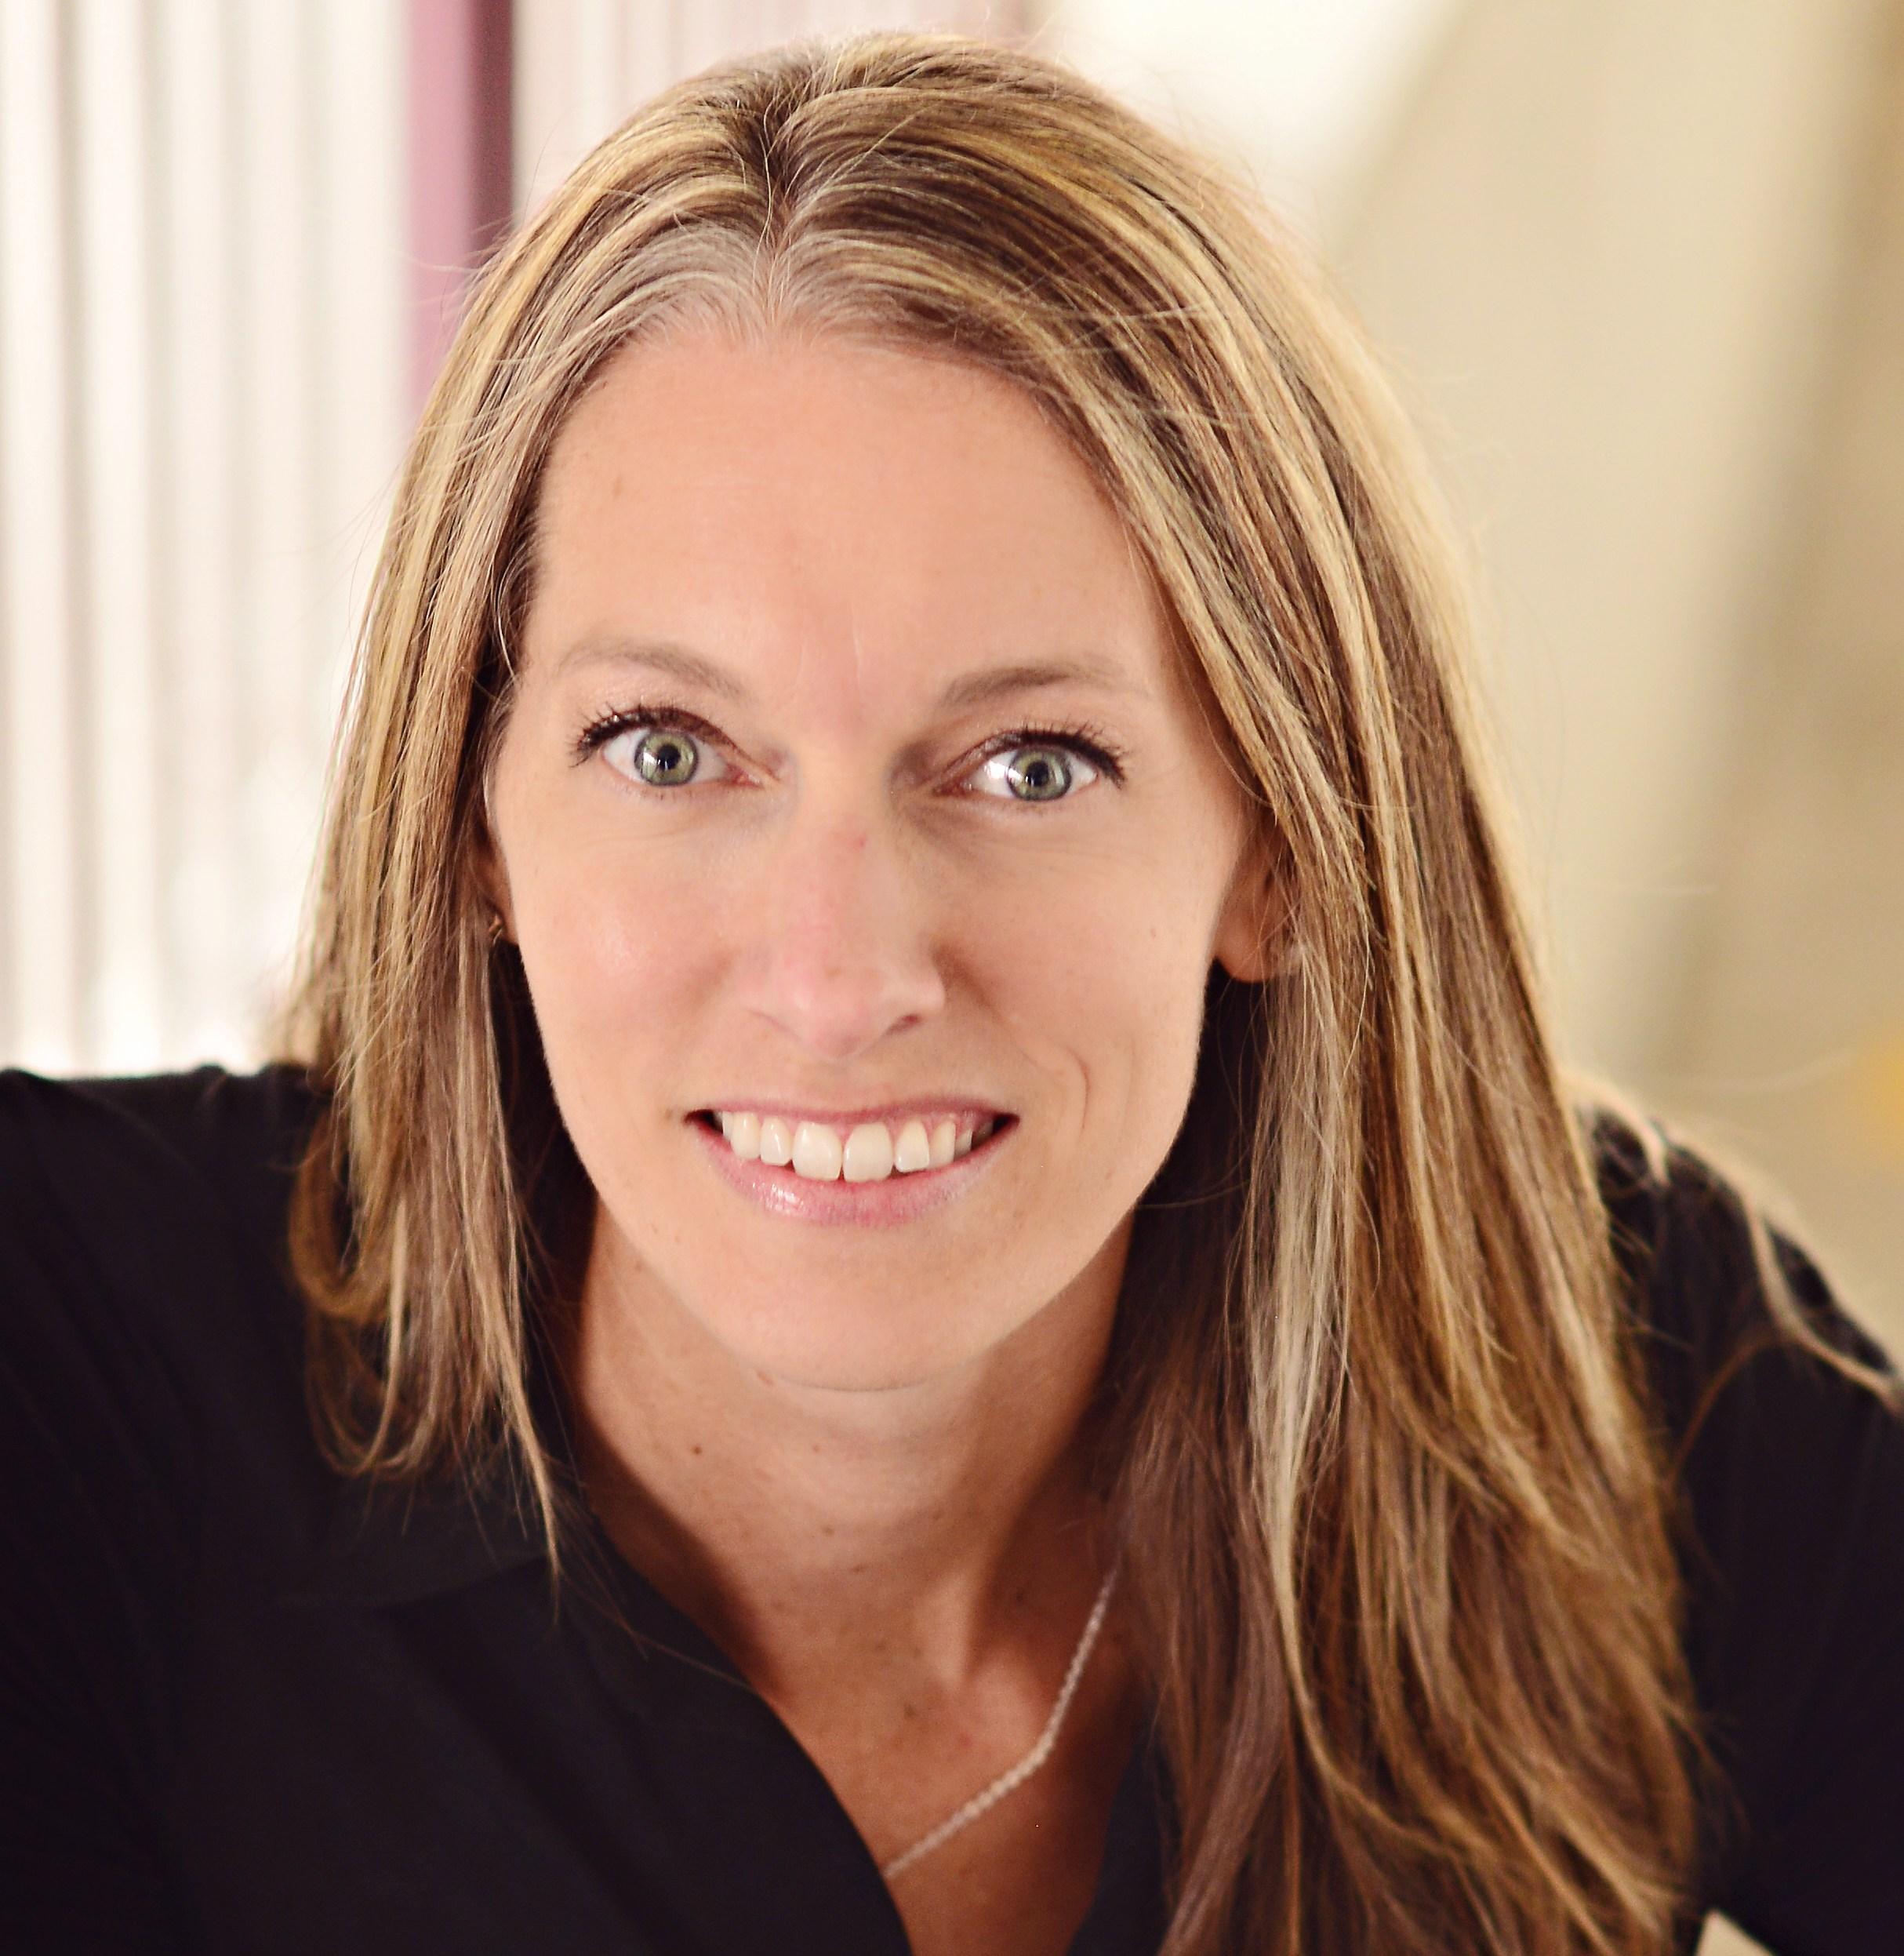 Rachel Thalmann